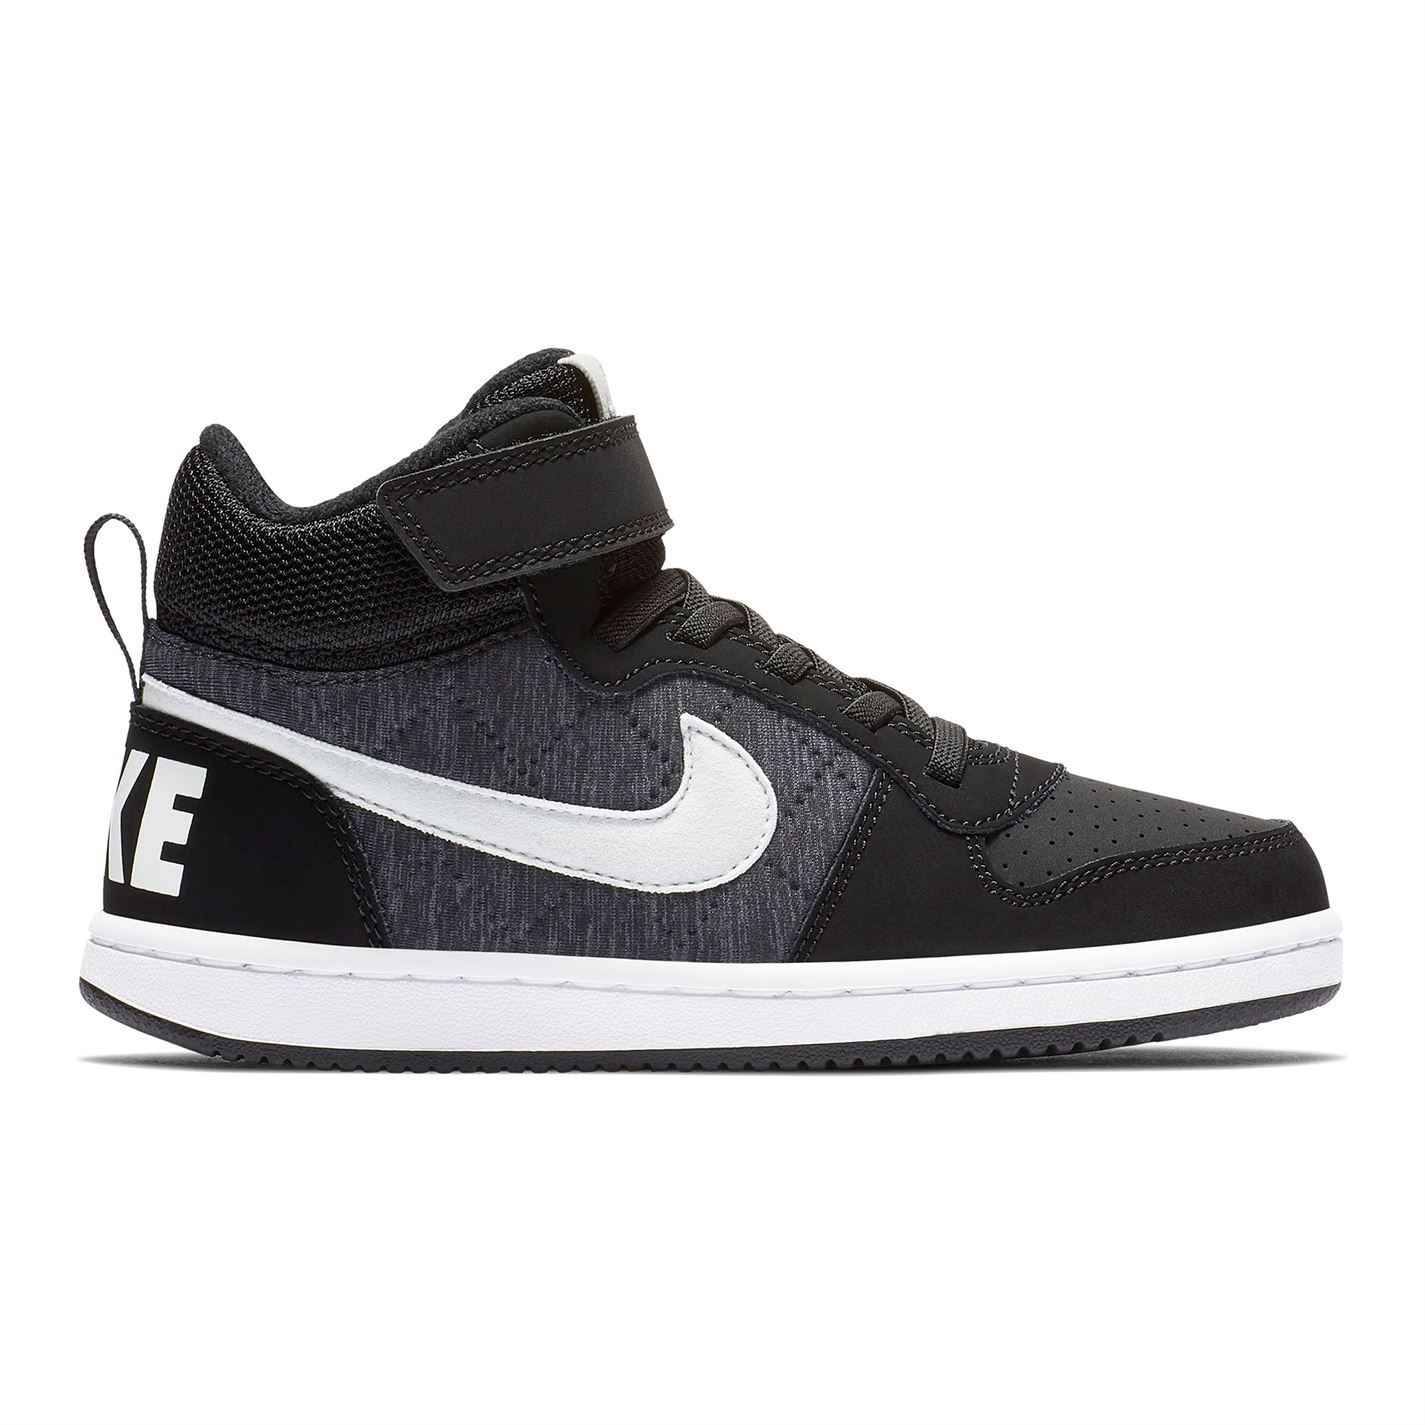 6a787ff036 ... Nike Court Borough Mid SE Child Boys Trainers Black Shoes Footwear ...